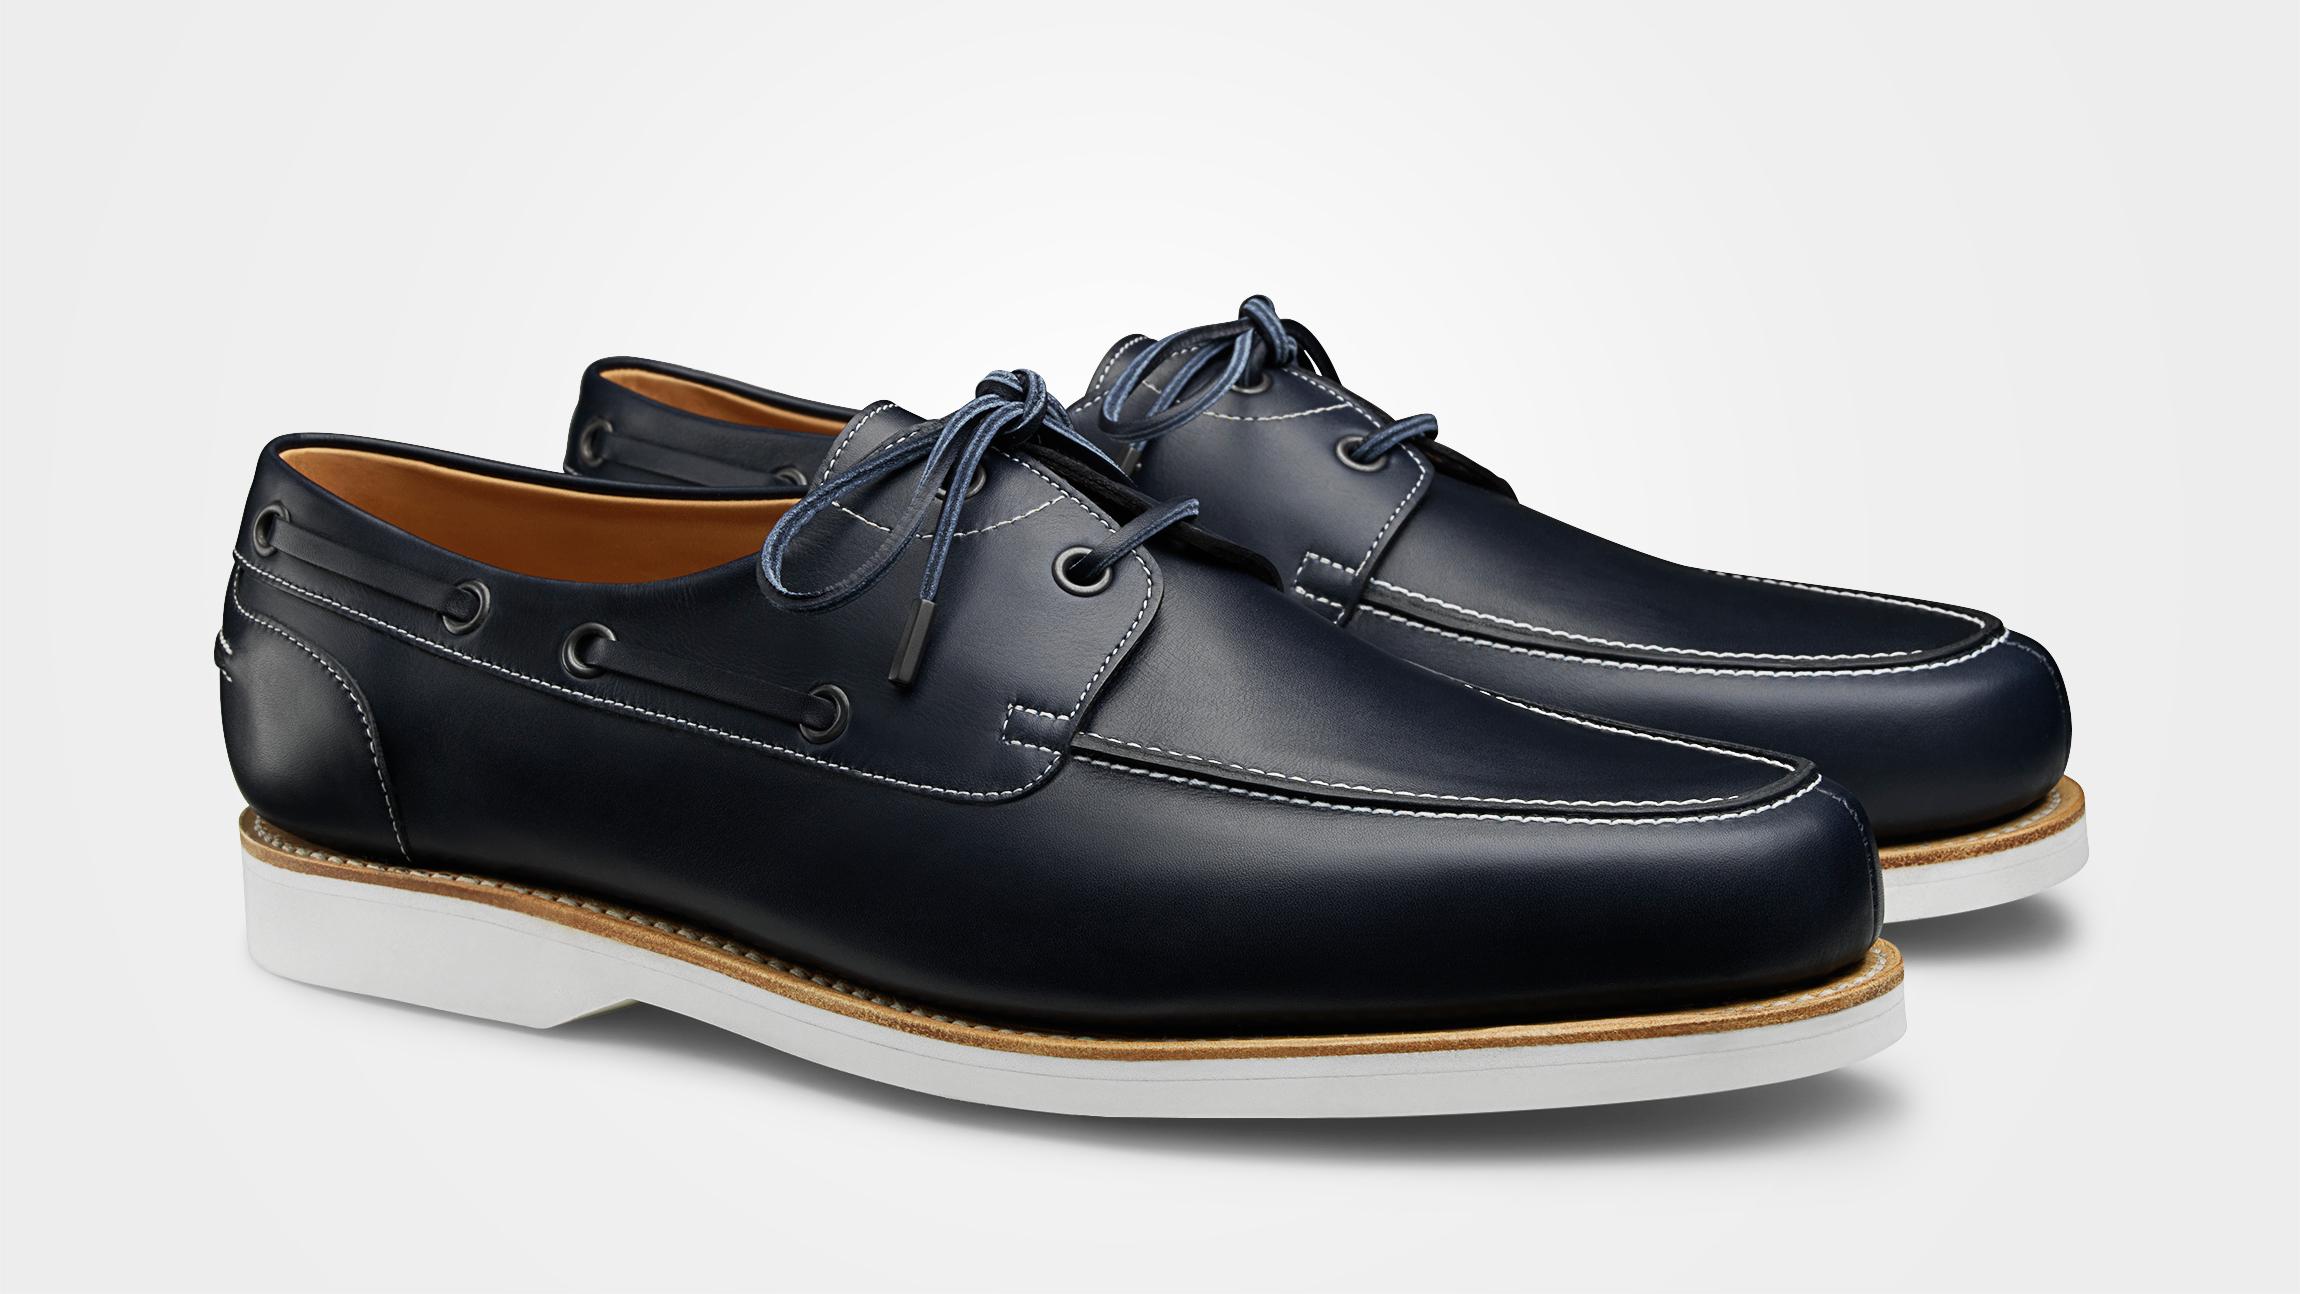 john lobb mens shoes